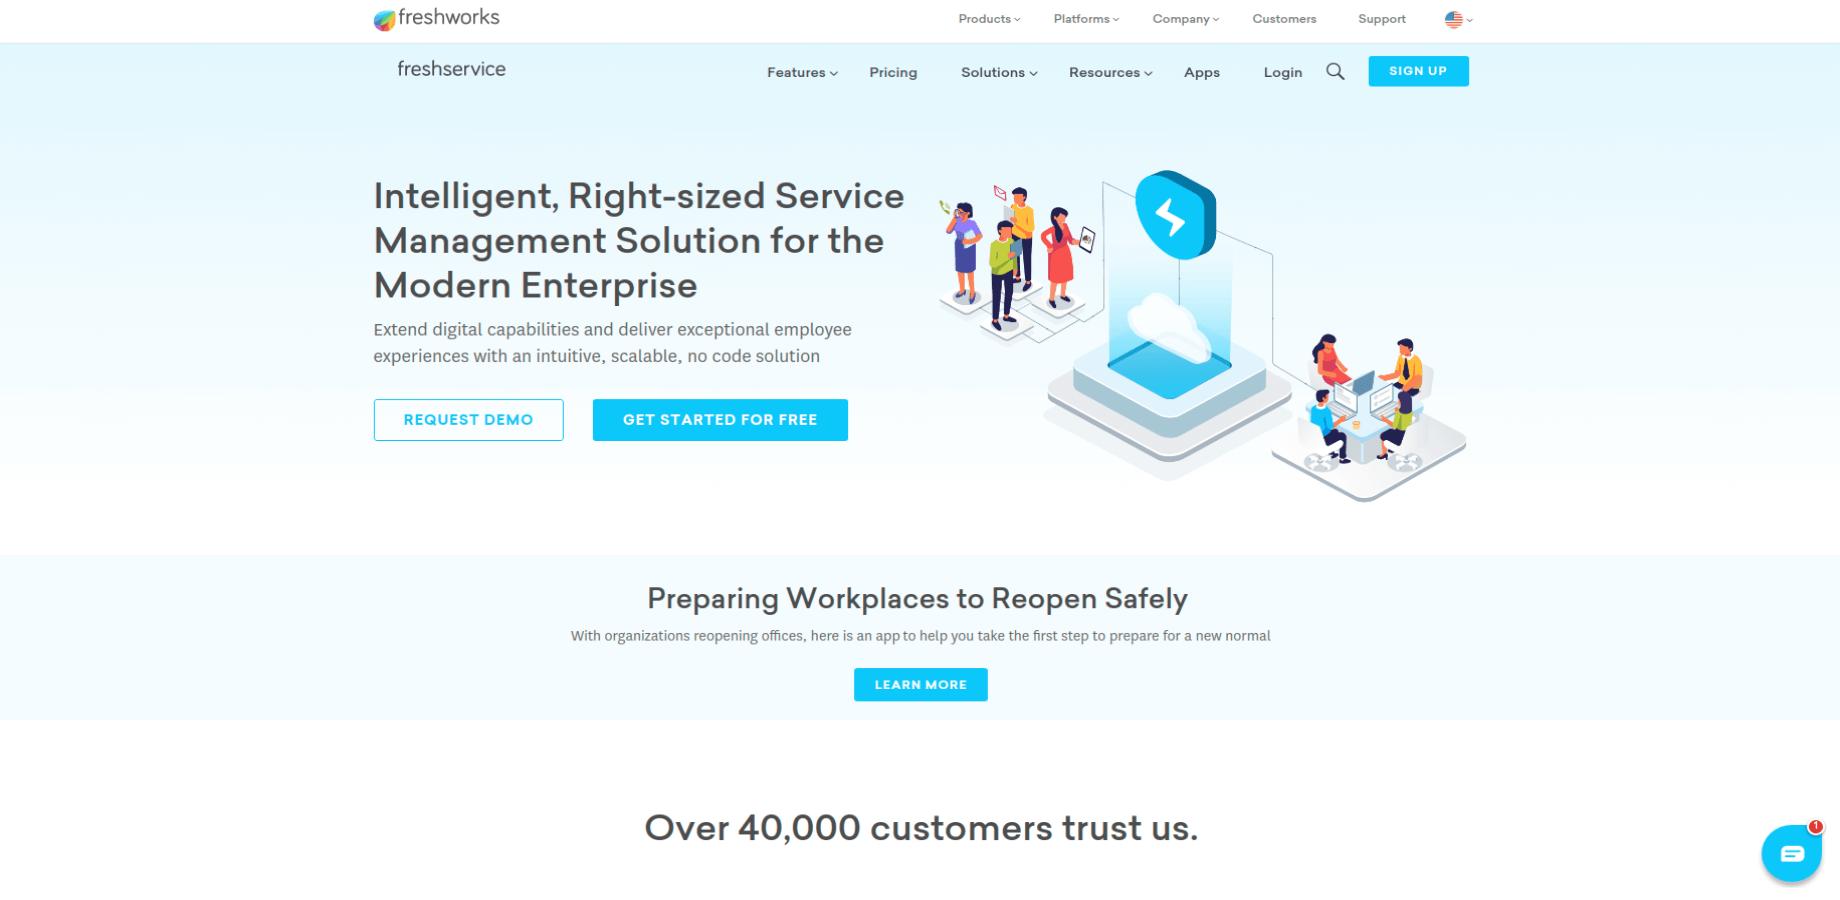 Freshservice Landing Page Screenshot